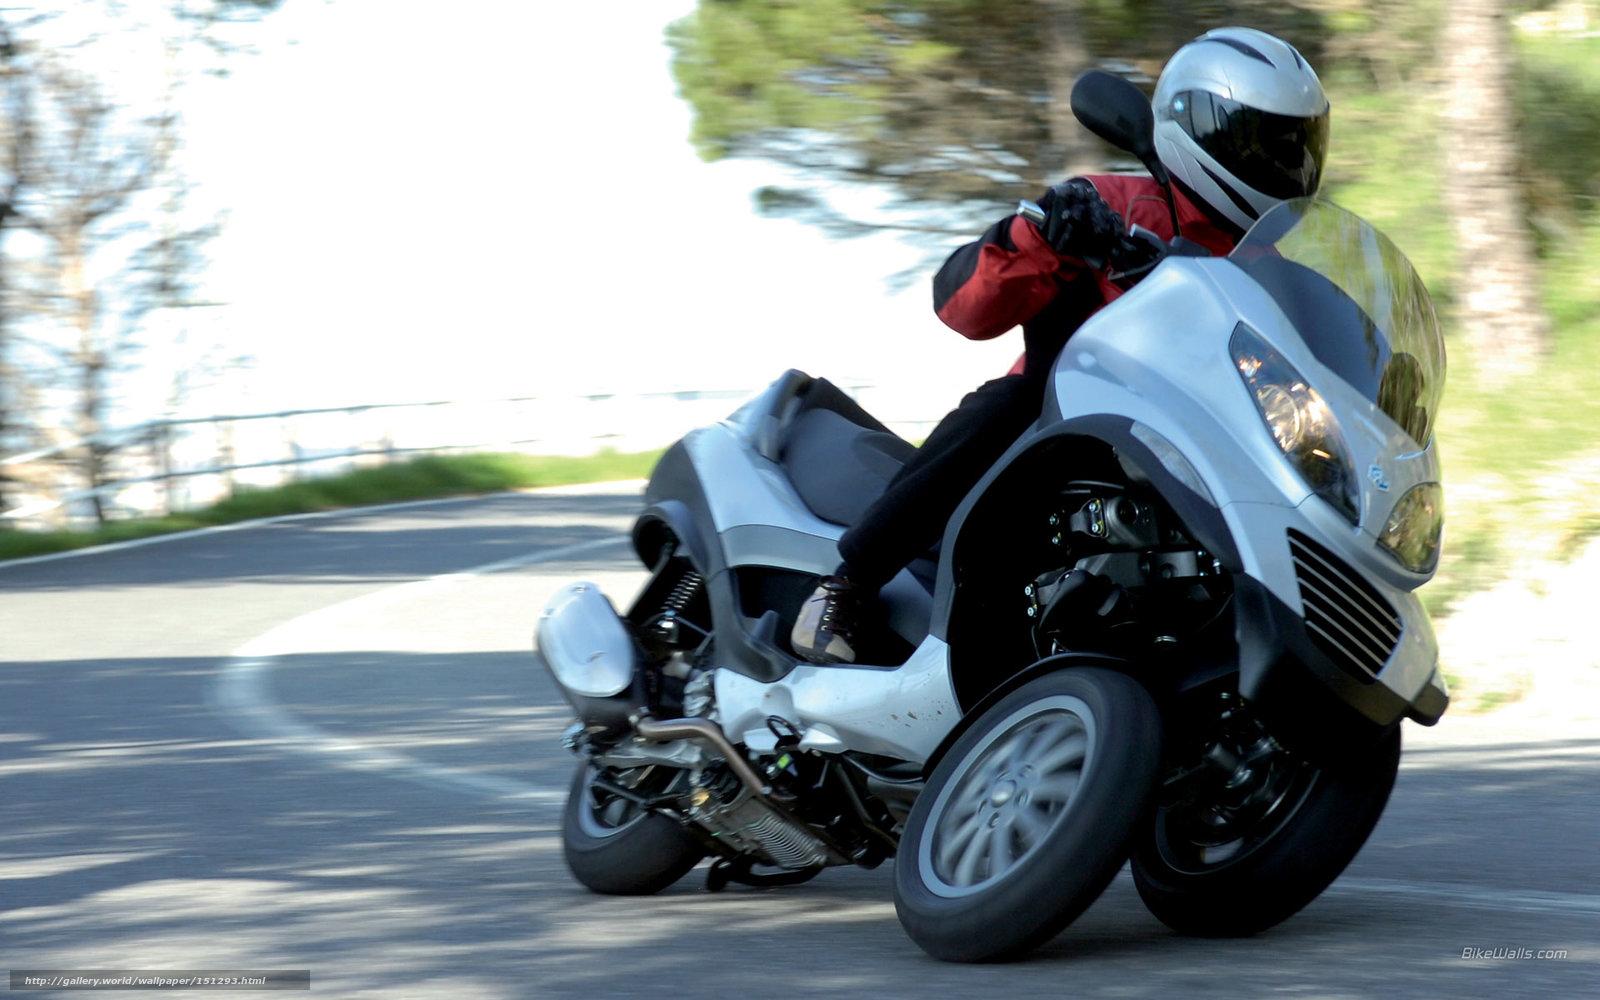 Открытка, смешные картинки про мотоцикл хонда